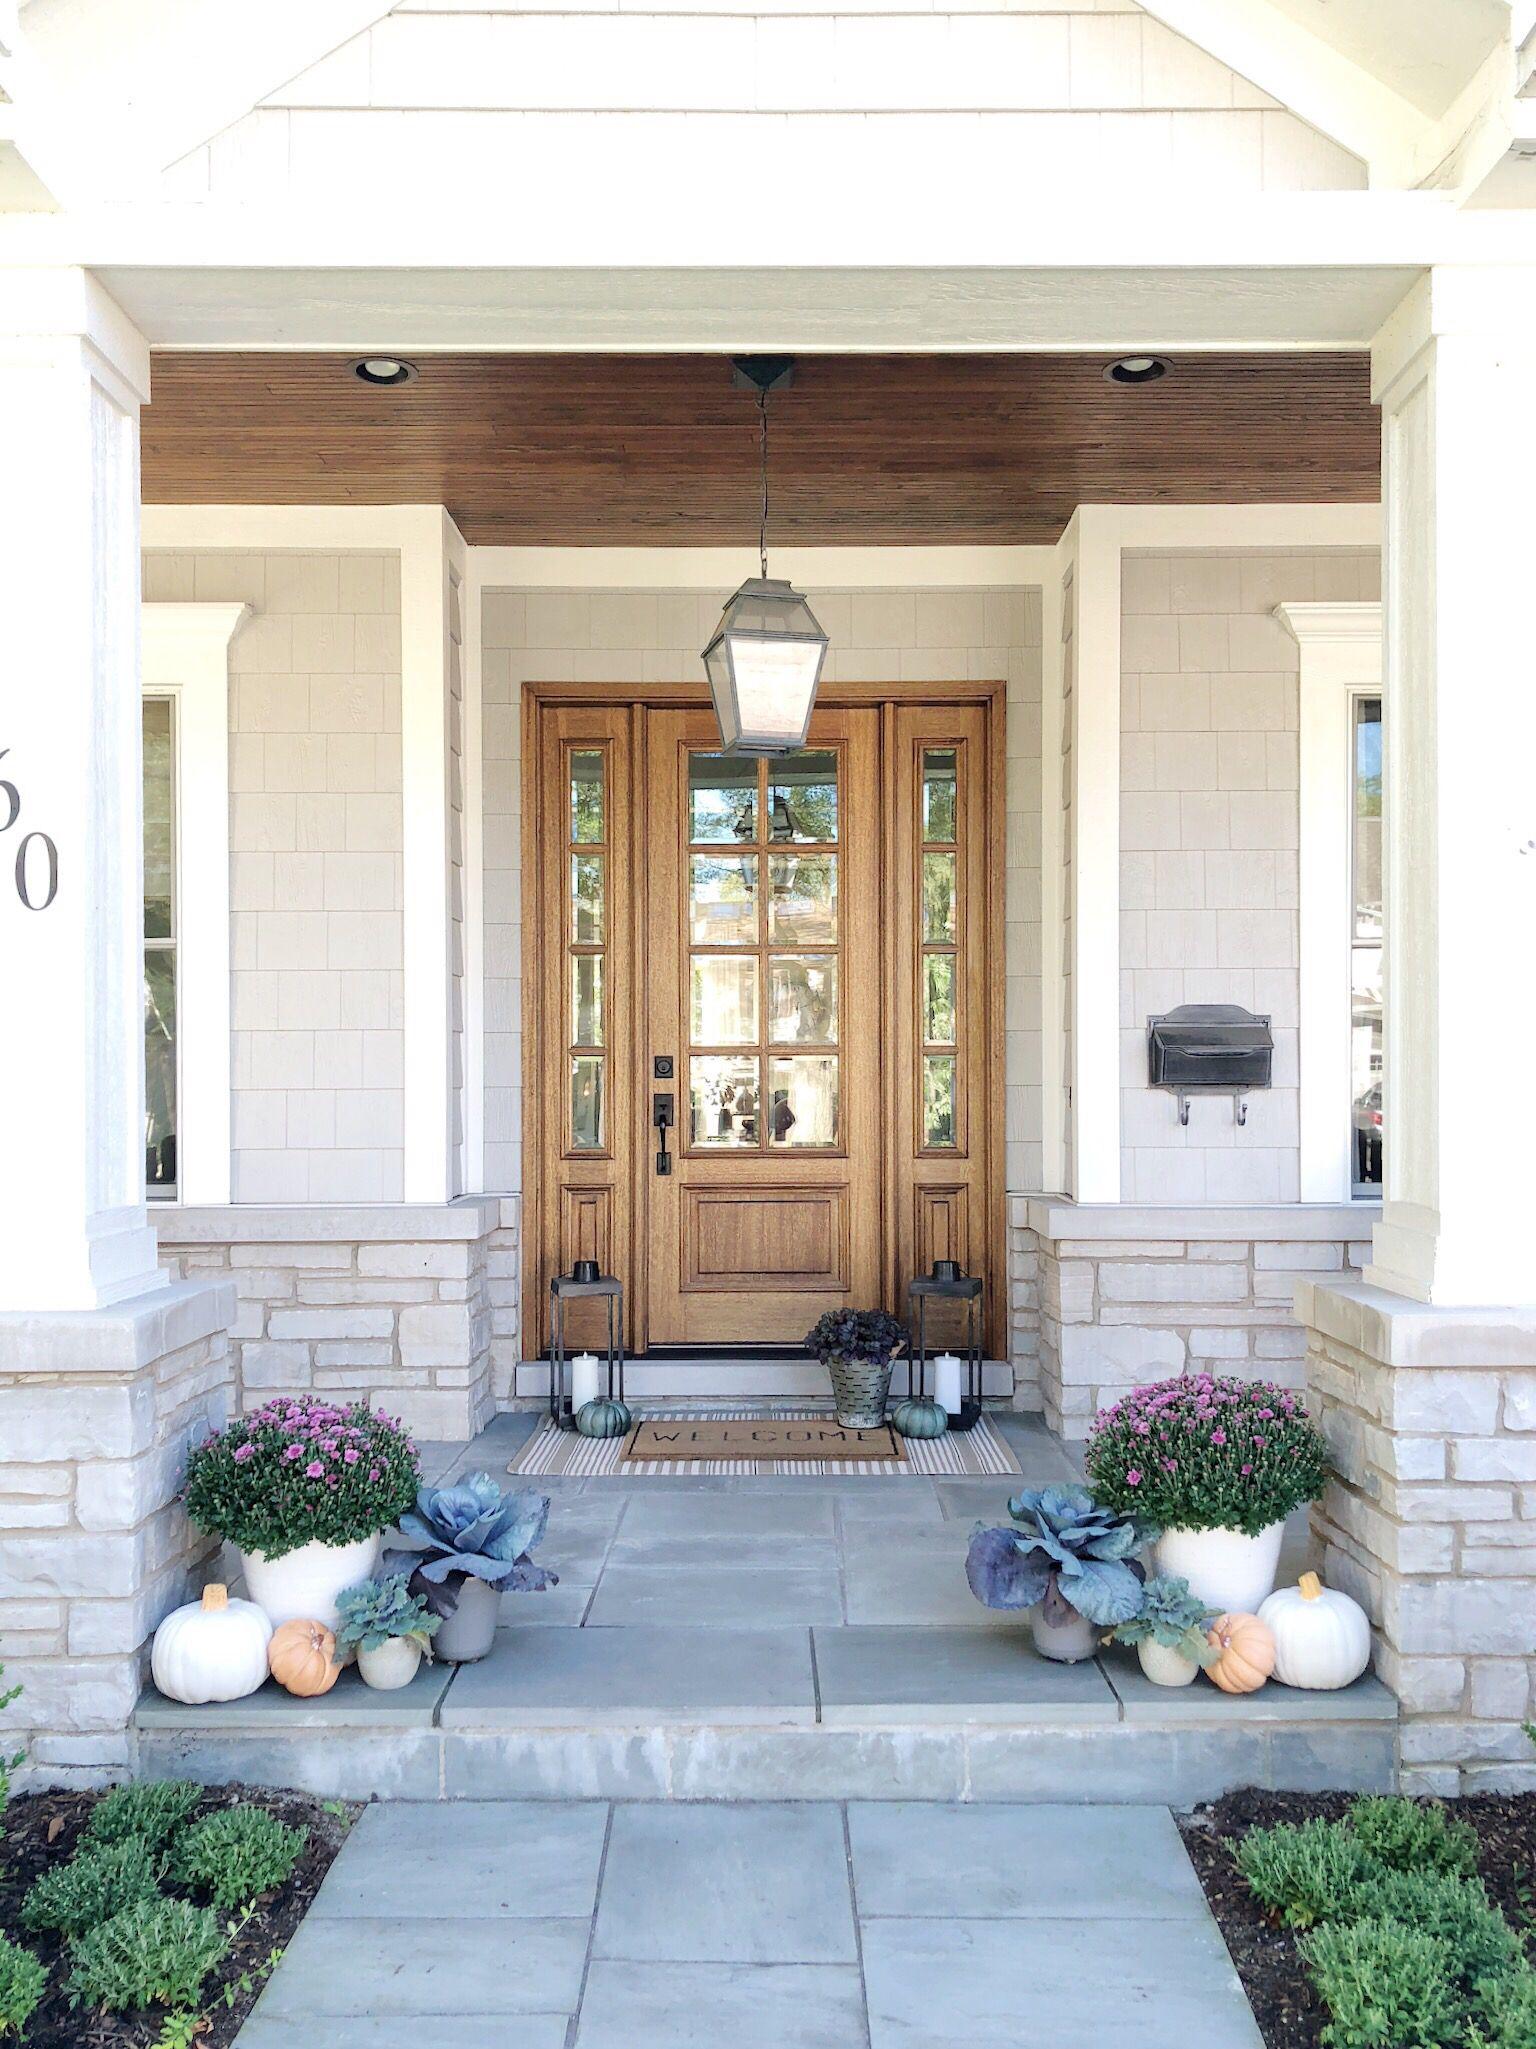 49 Most Popular Modern Dream House Exterior Design Ideas 3 In 2020: Front Door Decor, Front Porch, Bluestone Porch, Fall Entry, Fall Porch #falldecor #fallporch